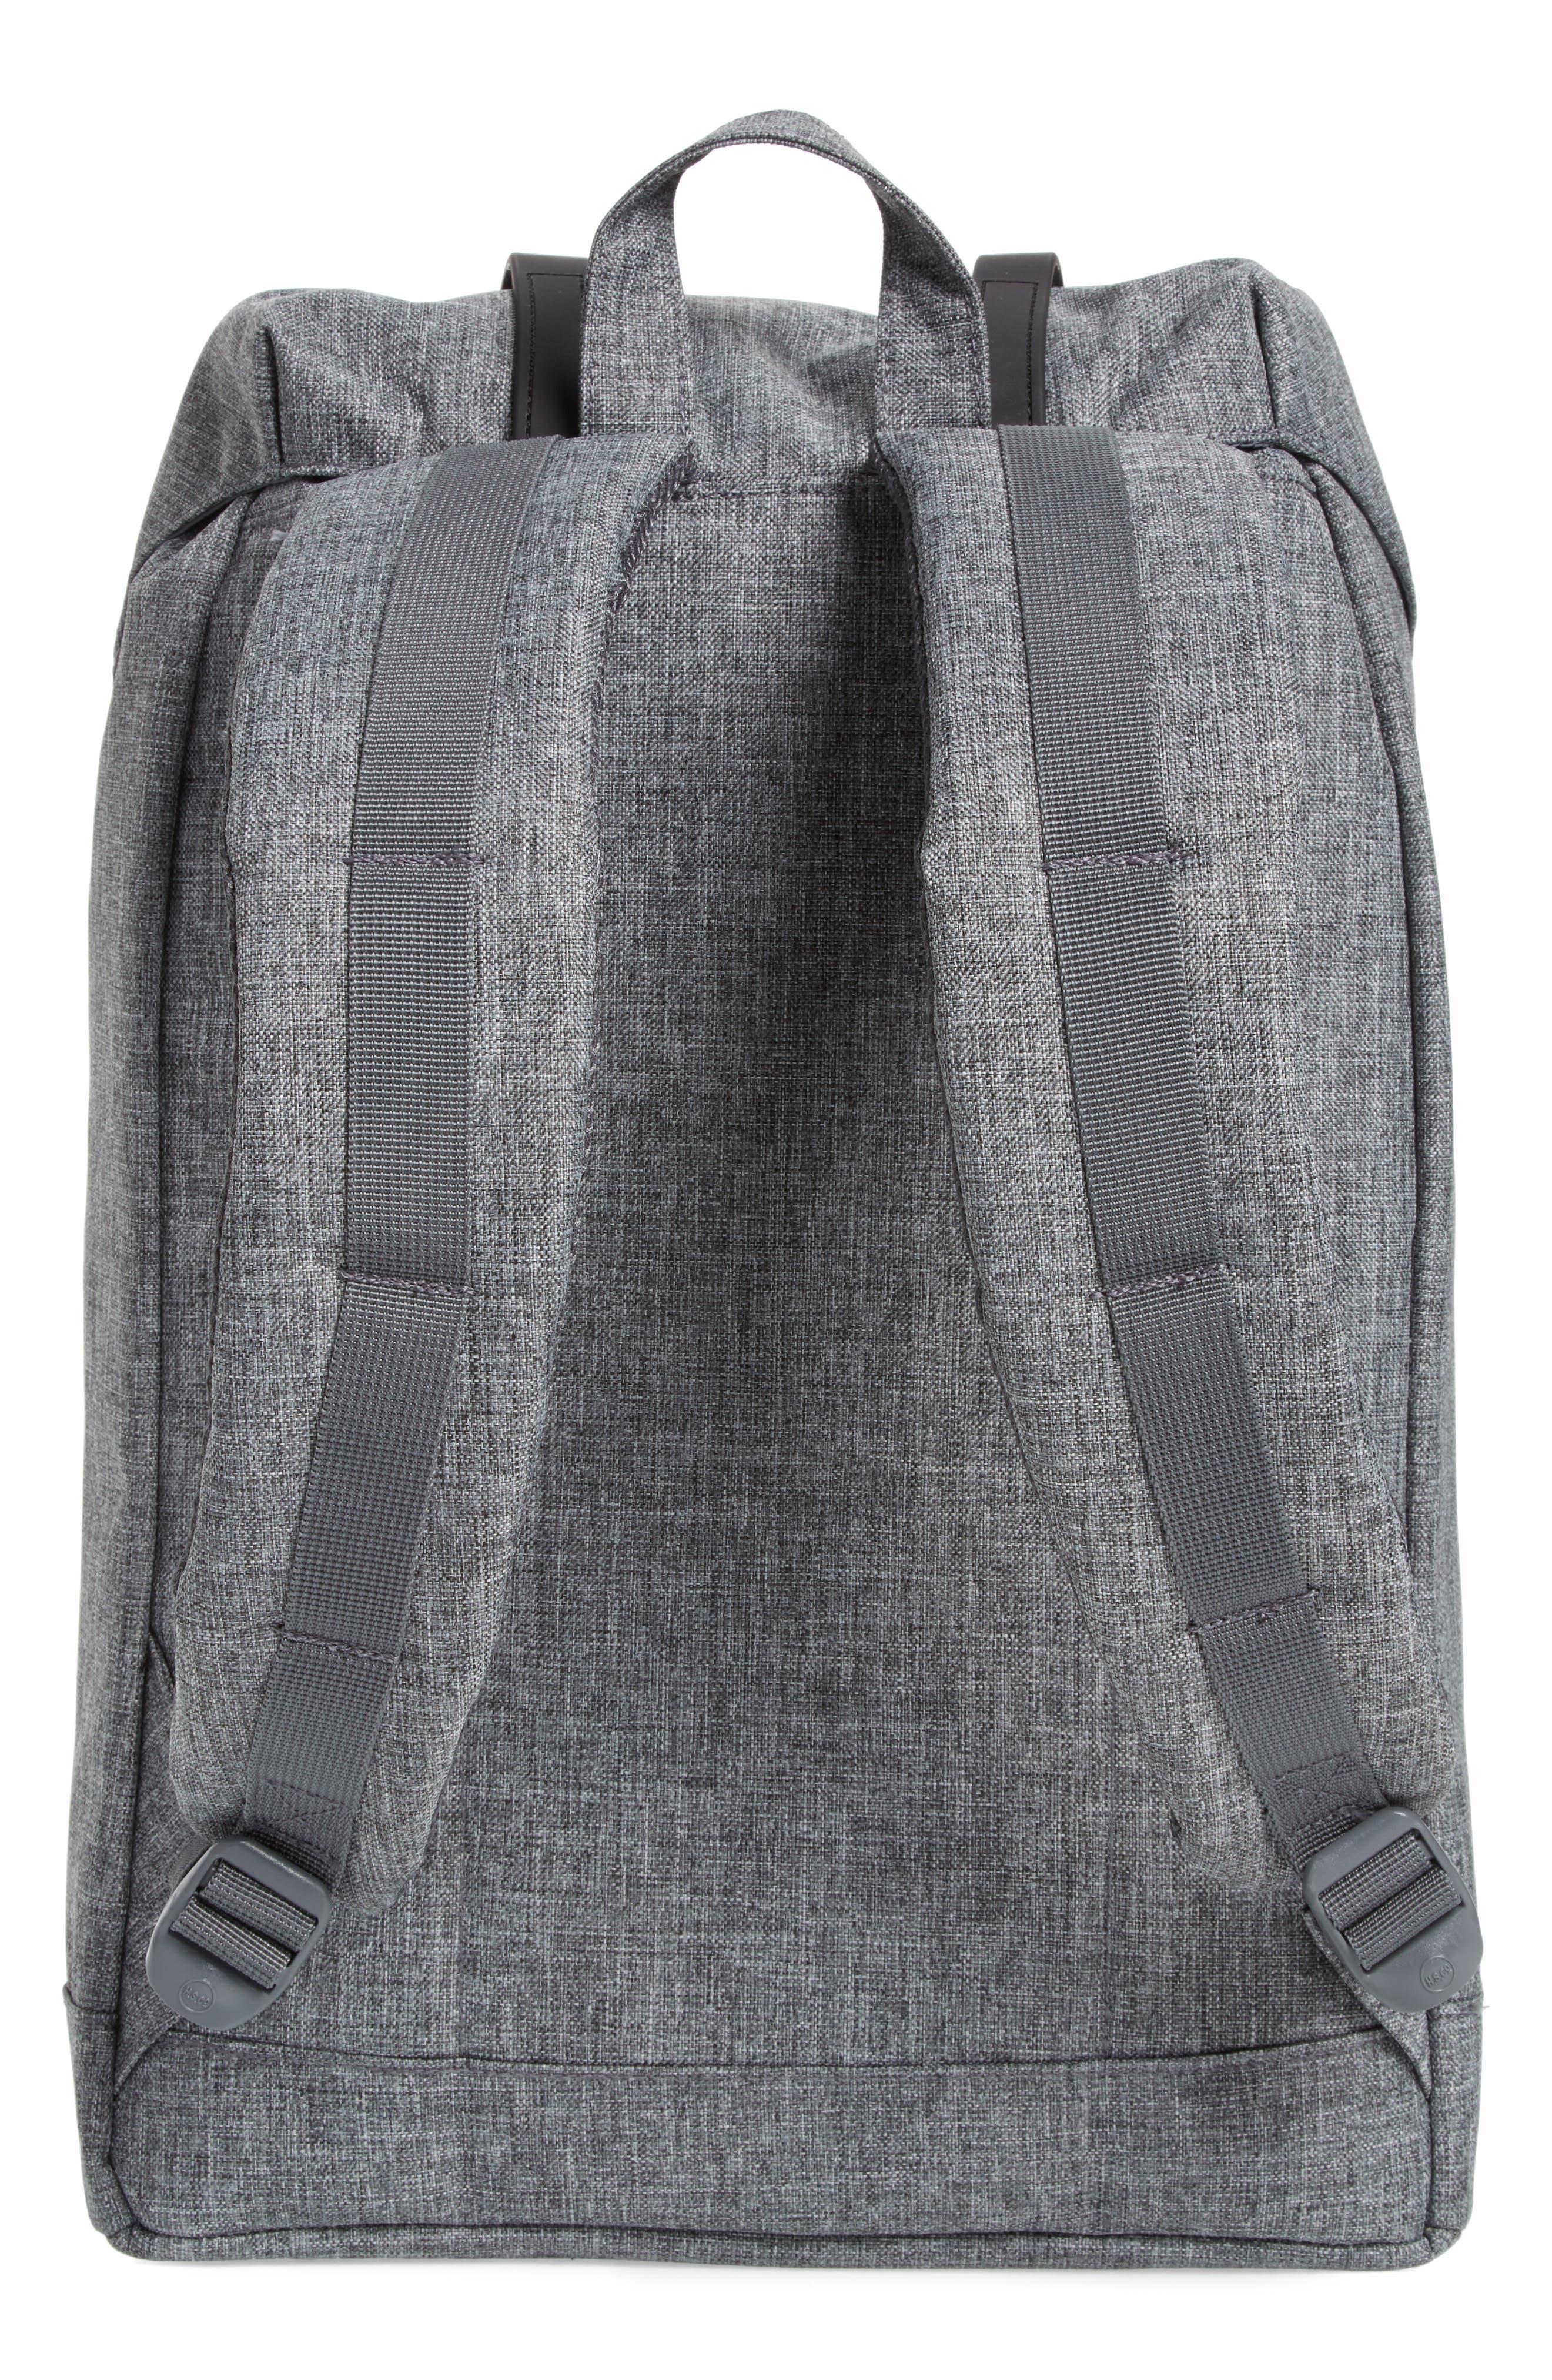 Retreat Backpack,                             Alternate thumbnail 3, color,                             RAVEN CROSSHATCH